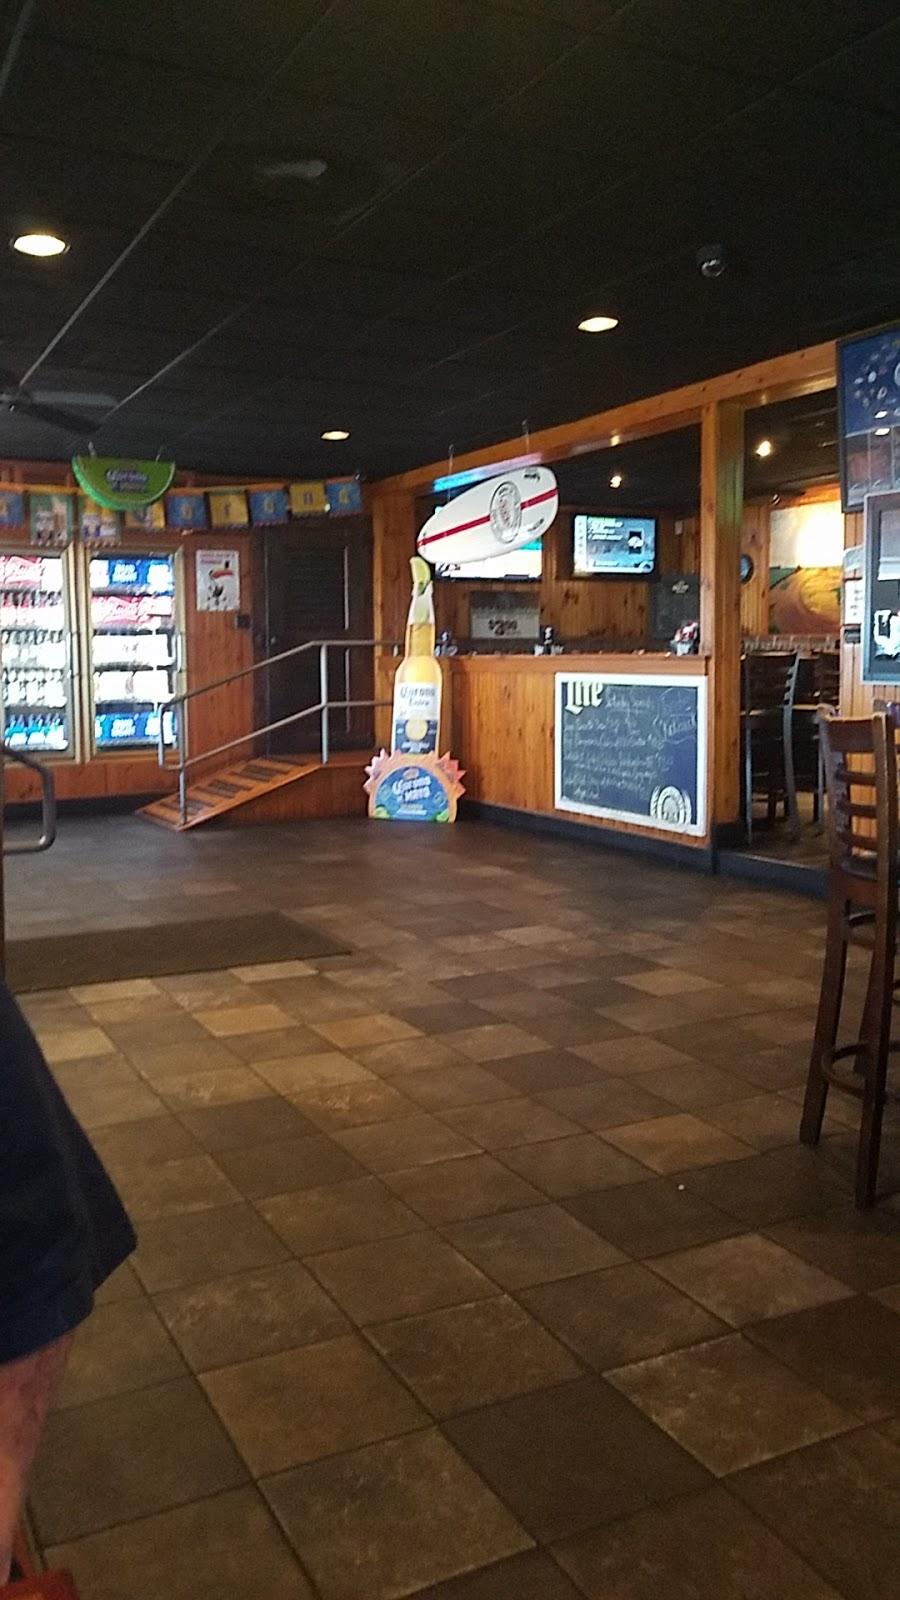 The Broadway Bar & Grill - restaurant  | Photo 3 of 10 | Address: 106 Randall Ave, Point Pleasant Beach, NJ 08742, USA | Phone: (732) 899-3272